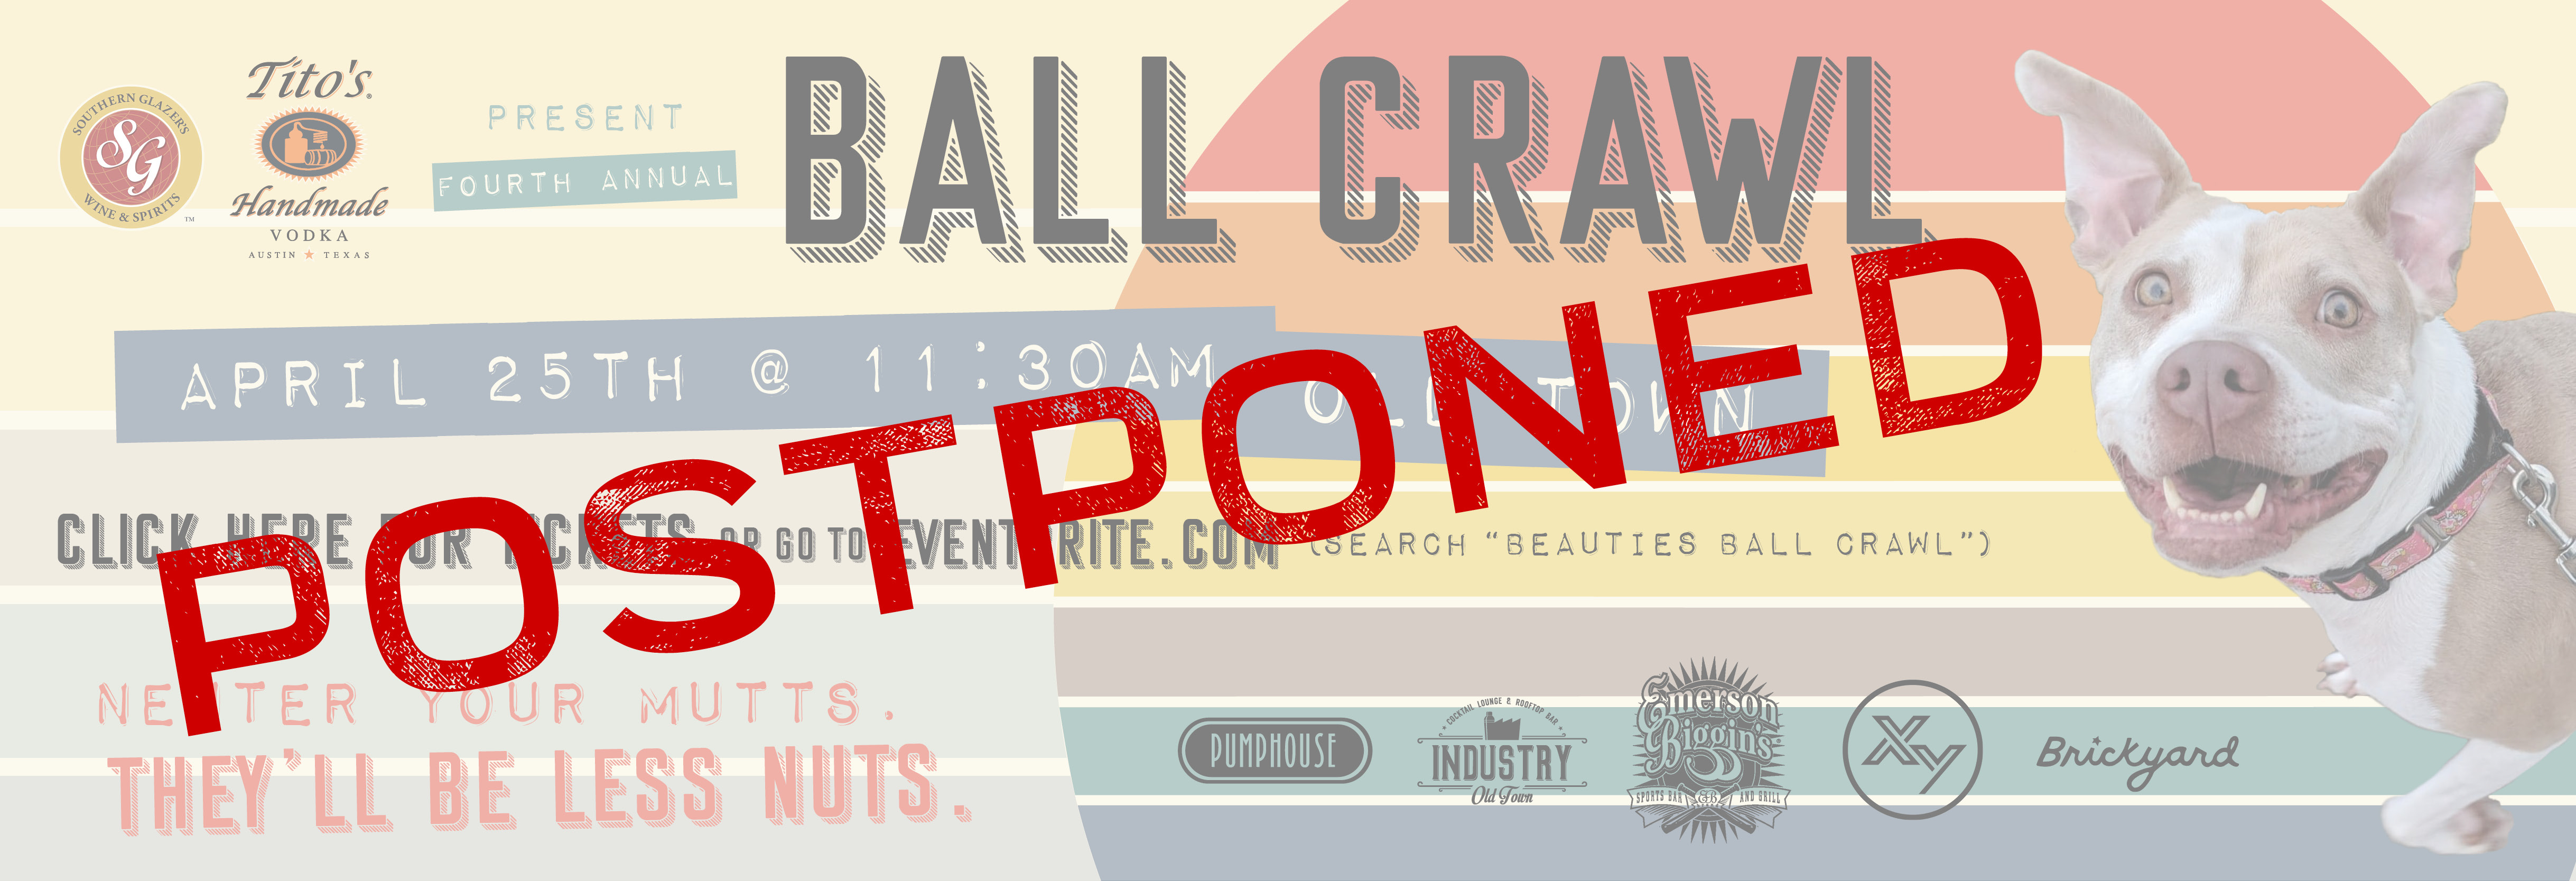 Ball Crawl